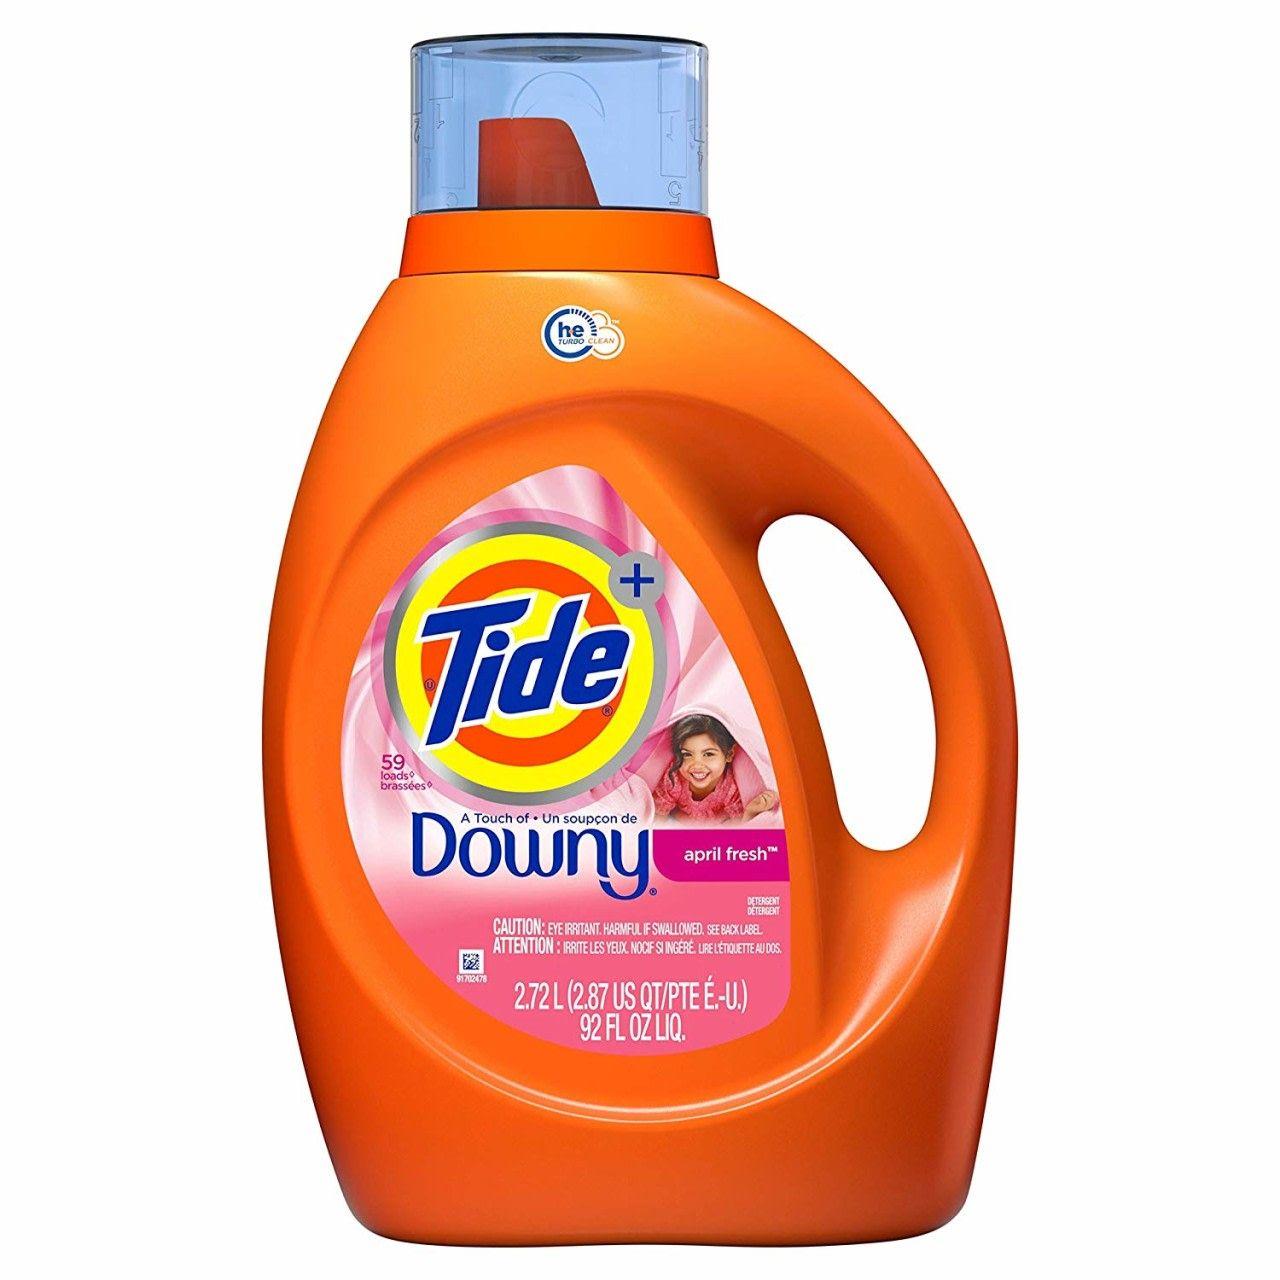 Hot Tide Laundry Detergent Liquid Plus Downy April Fresh Scent